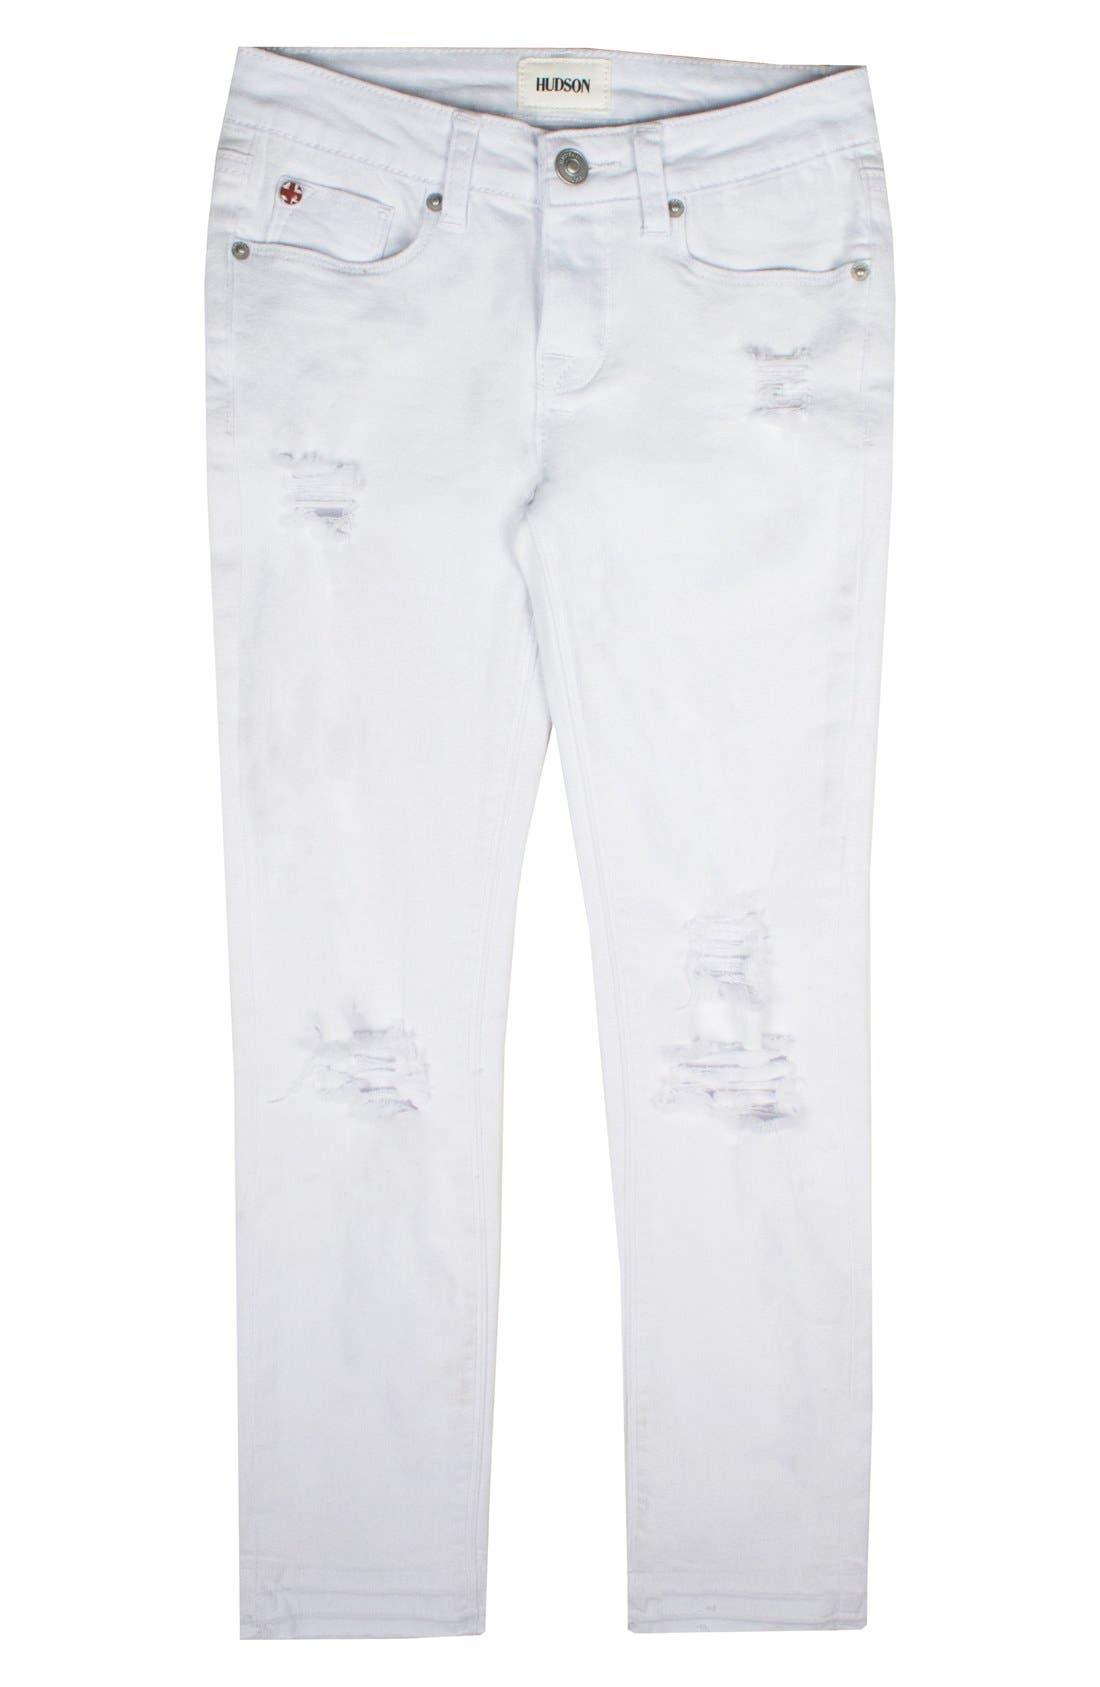 Main Image - Hudson Kids Seaside Crop Skinny Jeans (Big Girls)